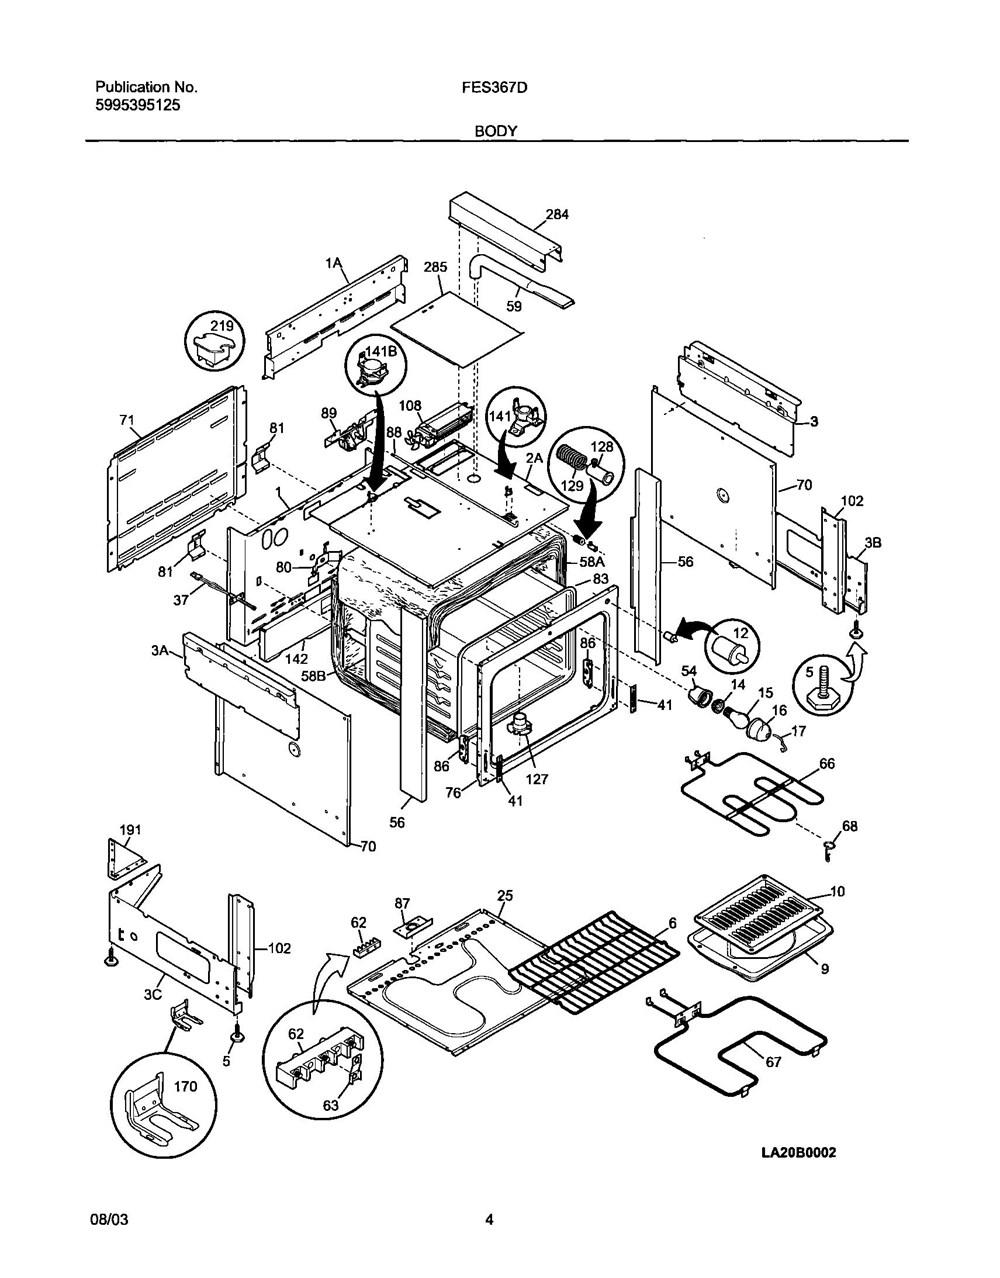 Fes367dsa Frigidaire Company Backguard 05body 07top Drawer 09door 01cover 10wiring Diagram